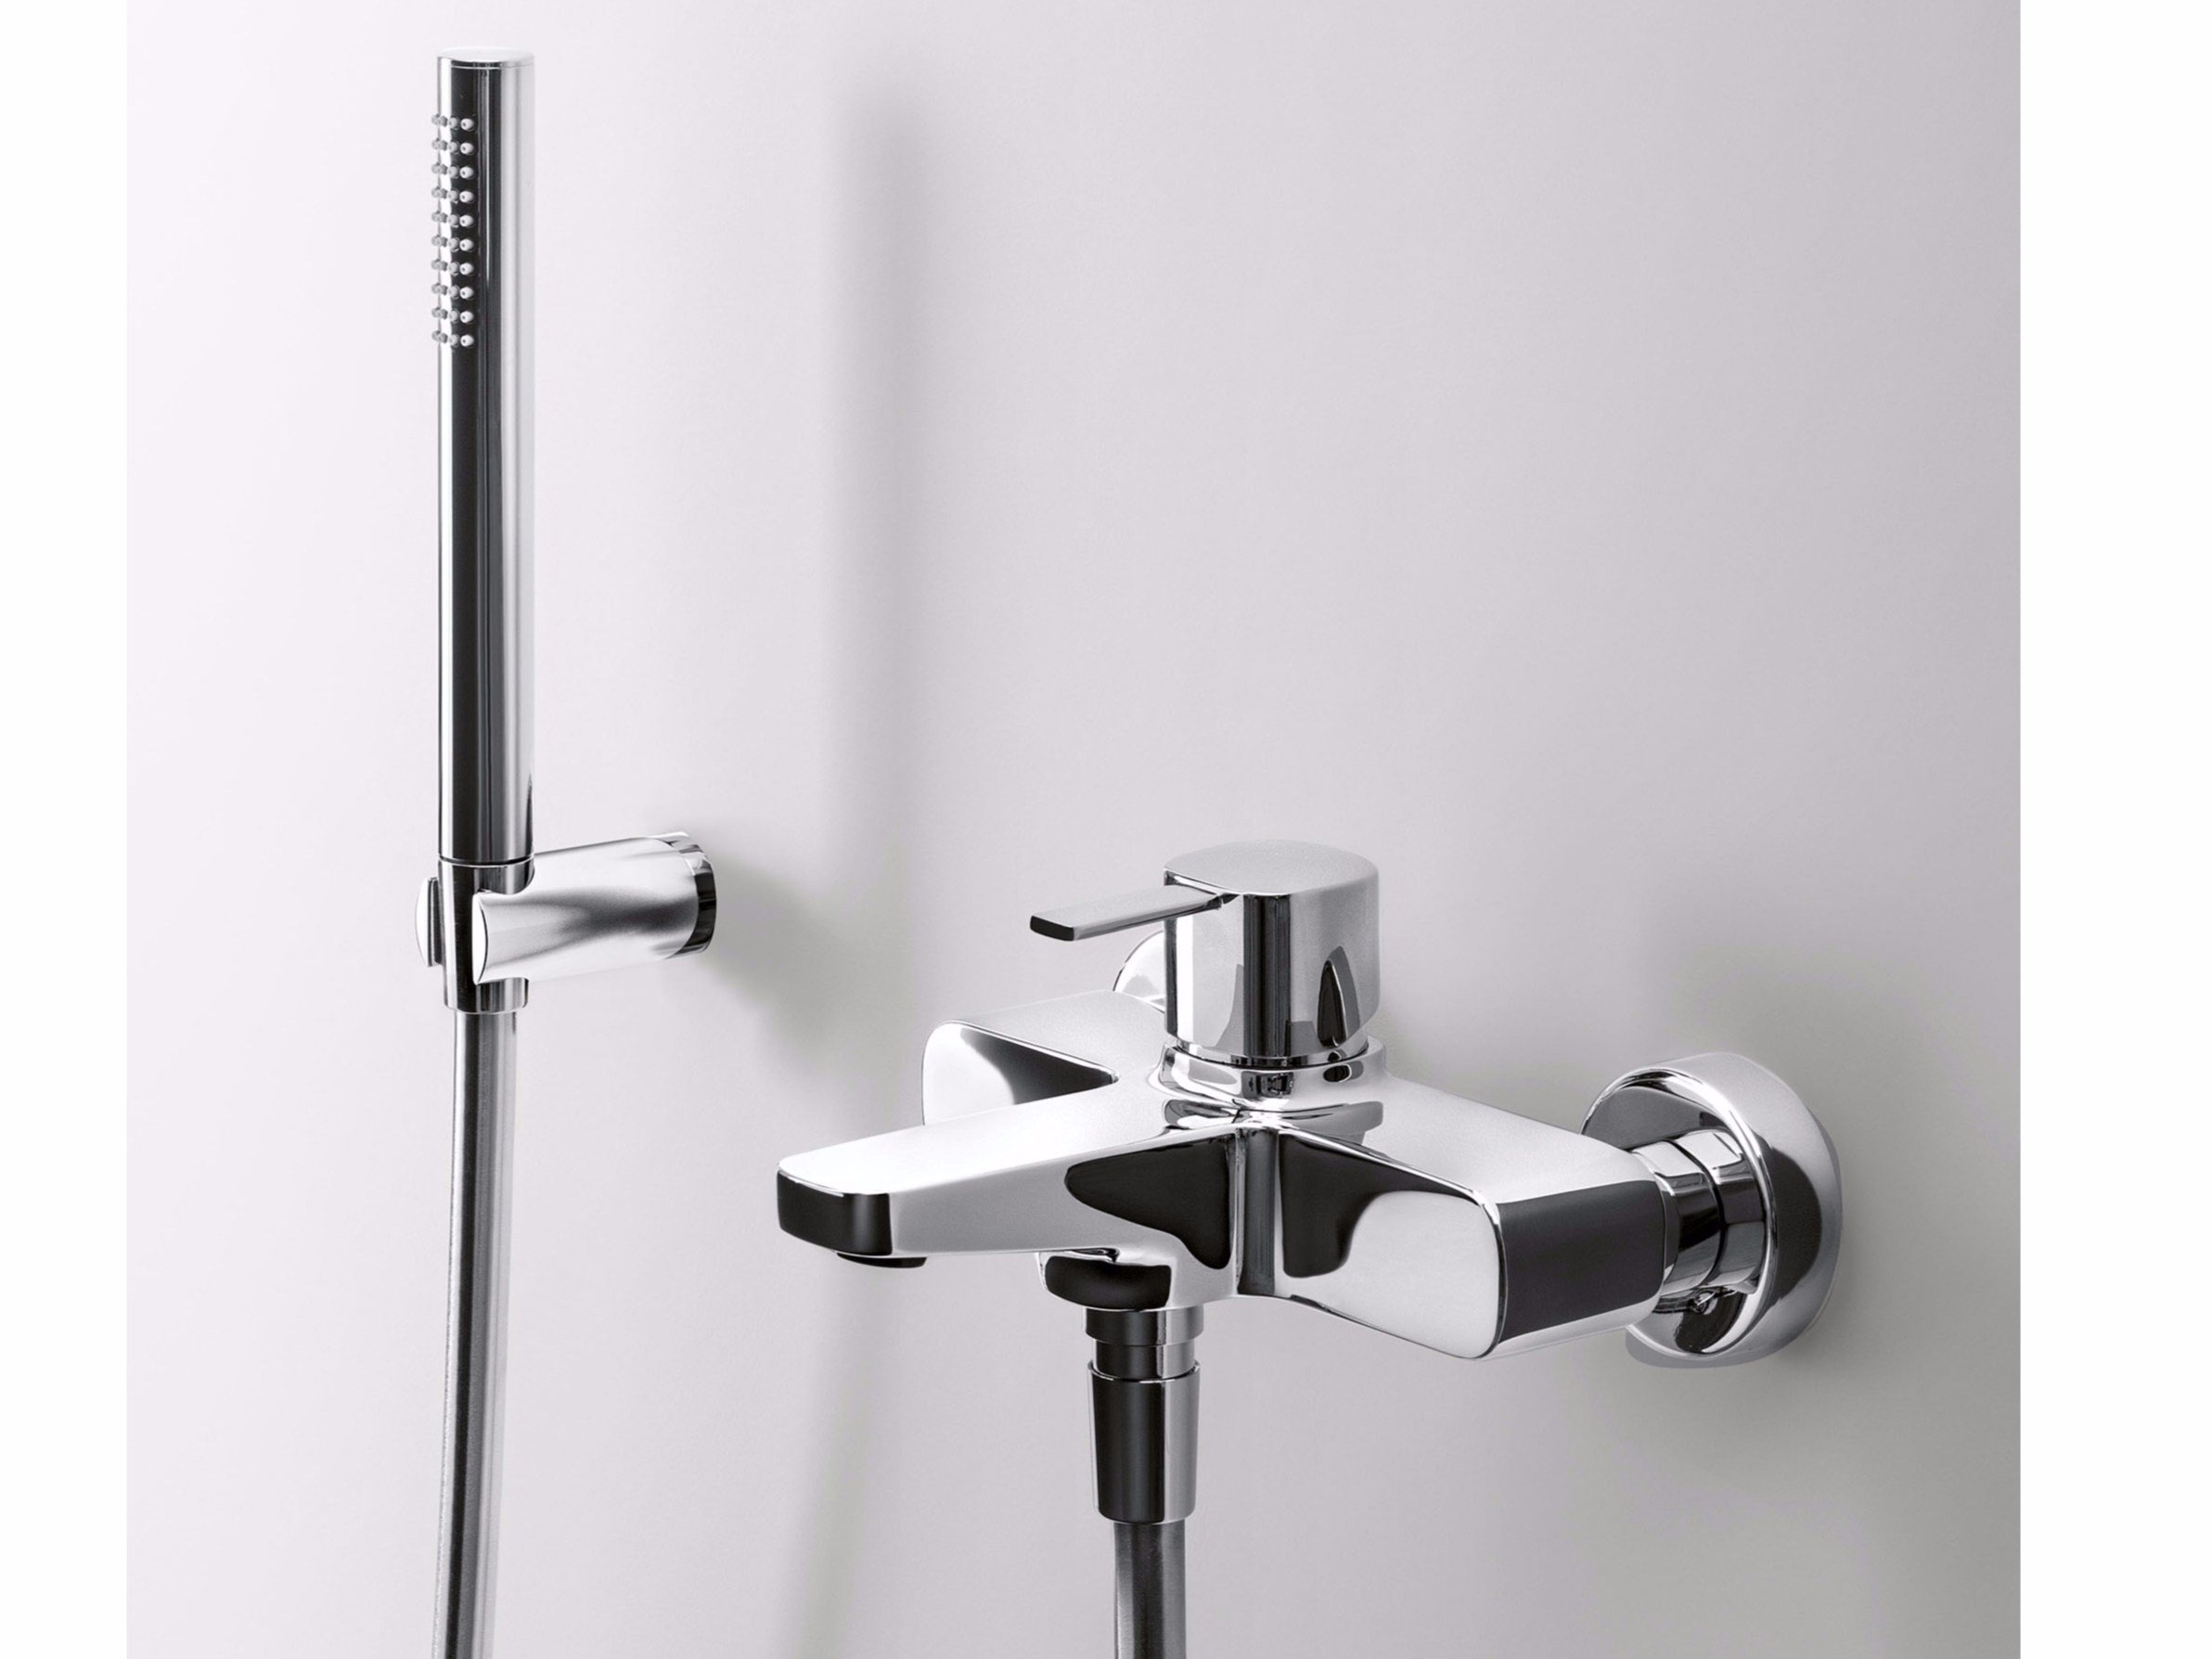 Best rubinetti cucina ikea images house interior for Ikea rubinetti cucina